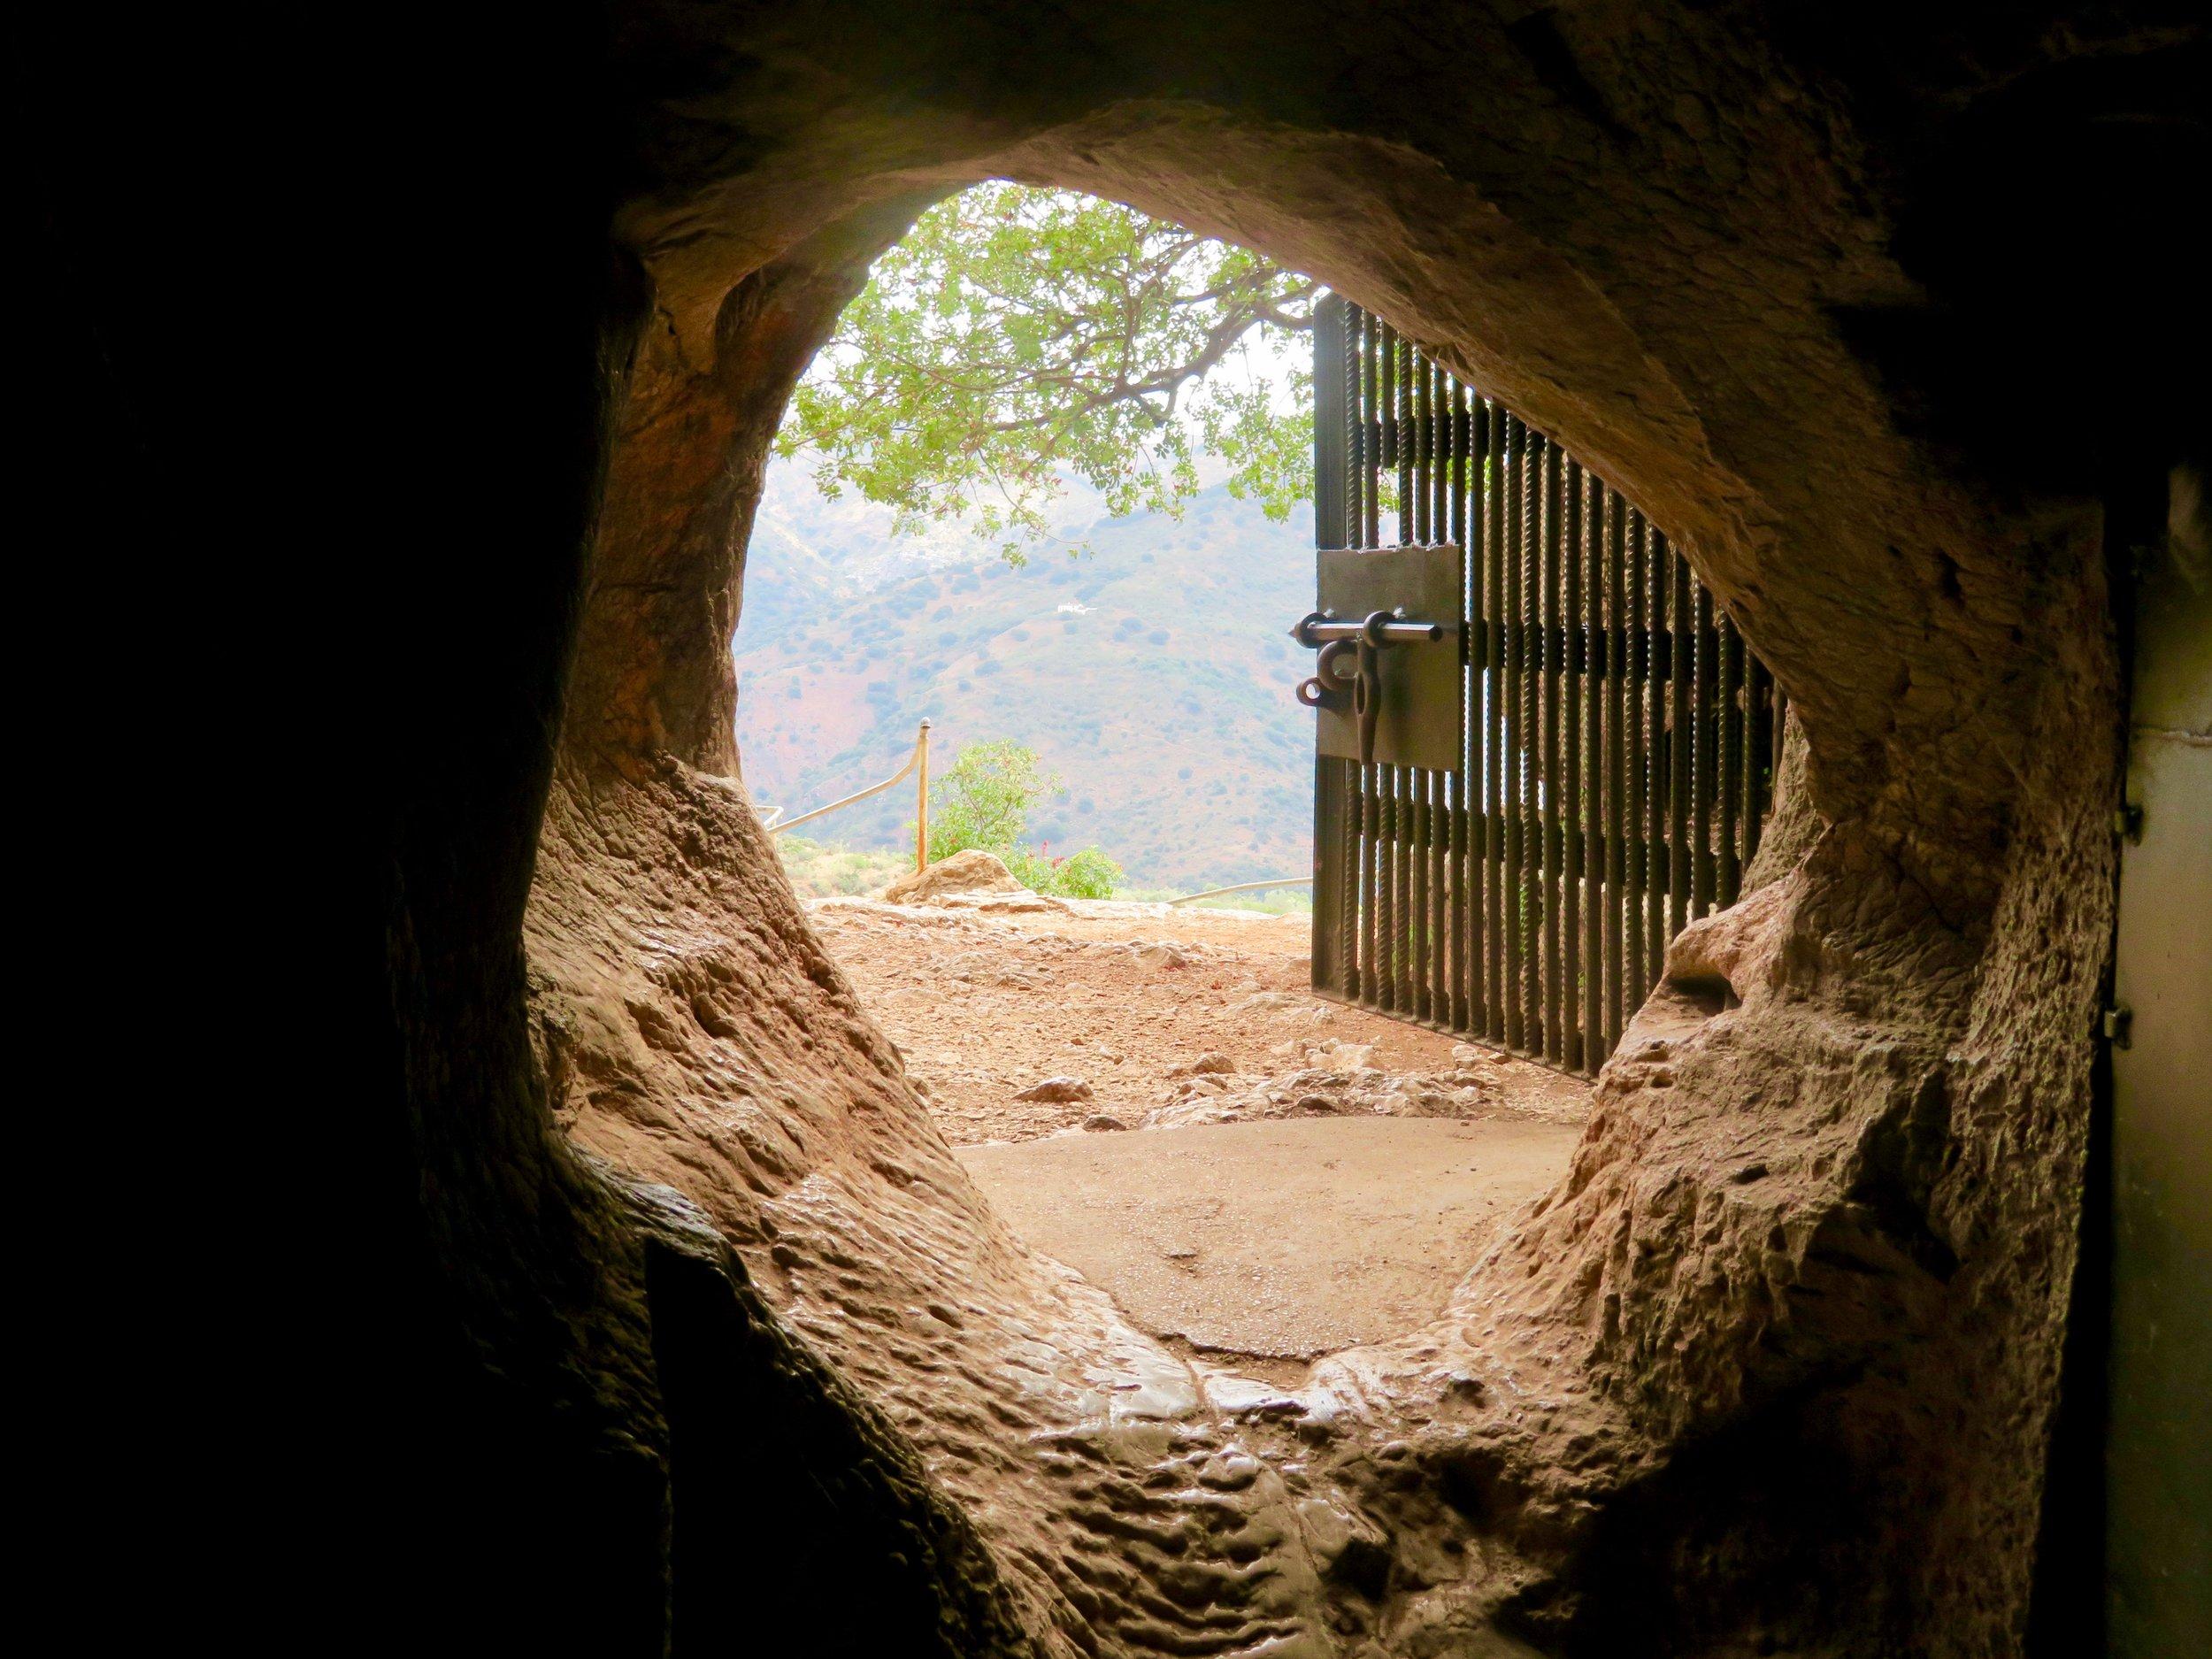 Mouth of the Cueva de la Pileta!